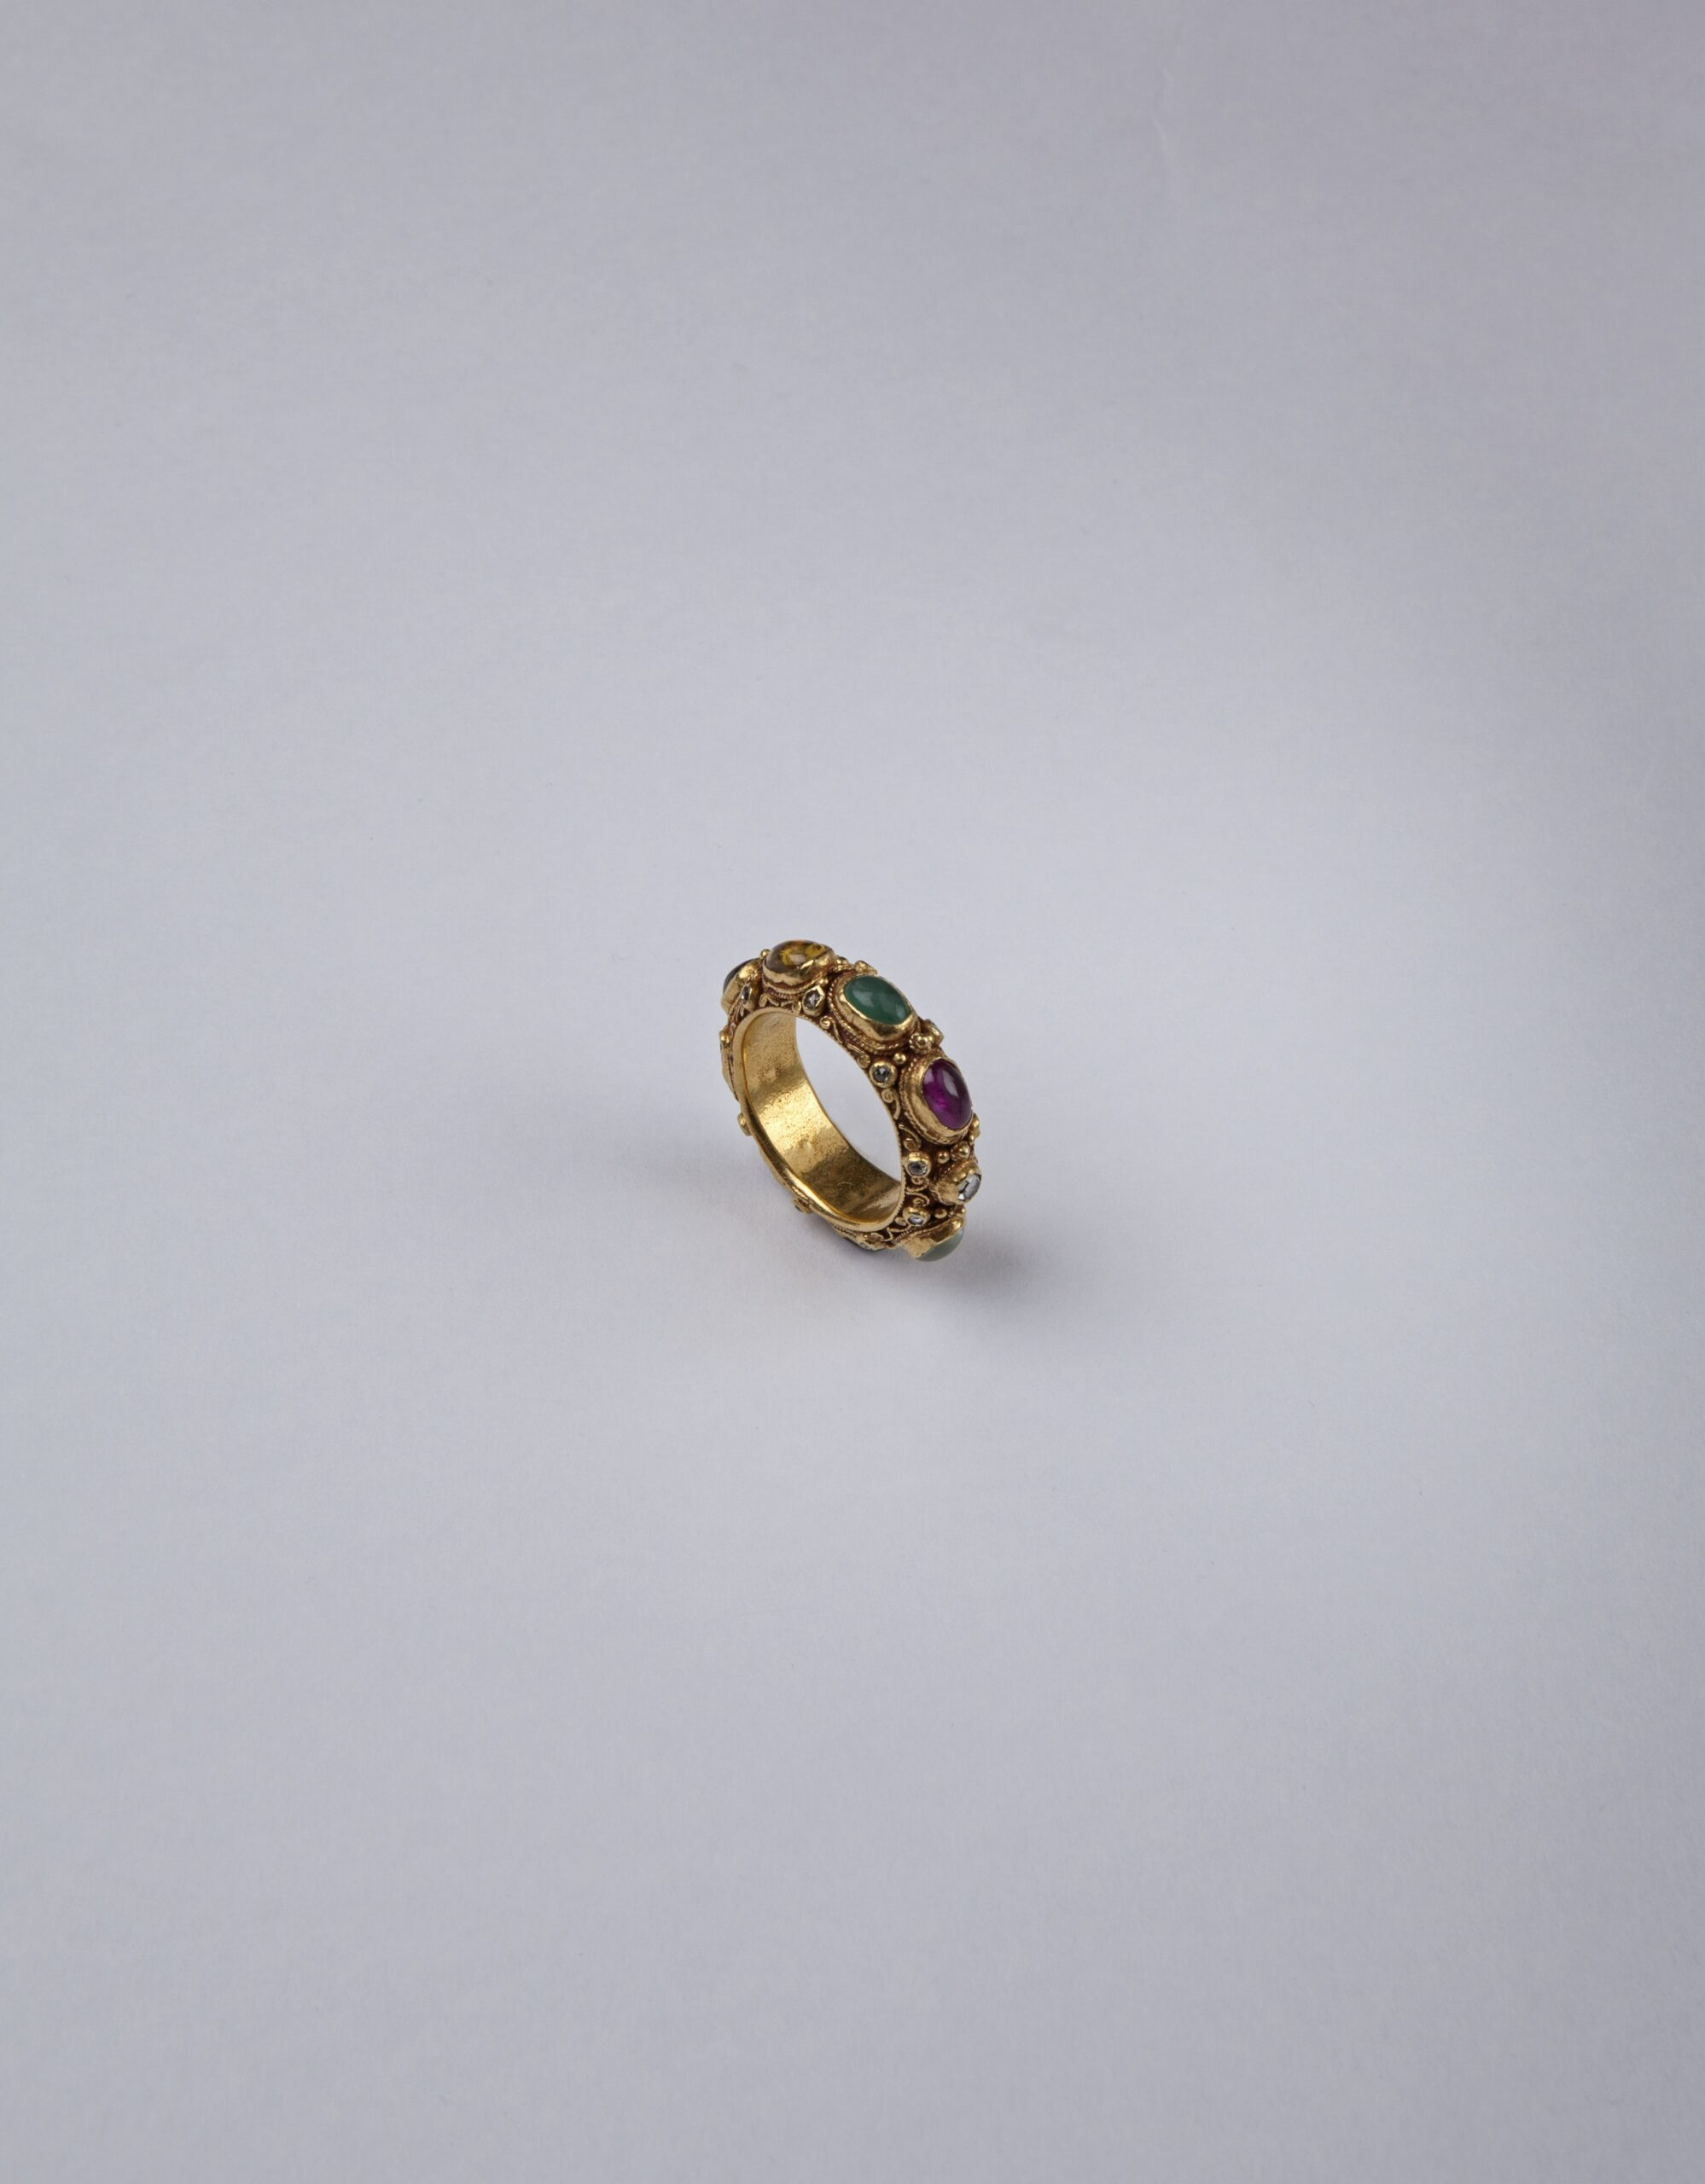 A GEM-SET GOLD NINE PLANET RING, THAILAND, RATTANAKOSIN PERIOD 19TH/20TH CENTURY